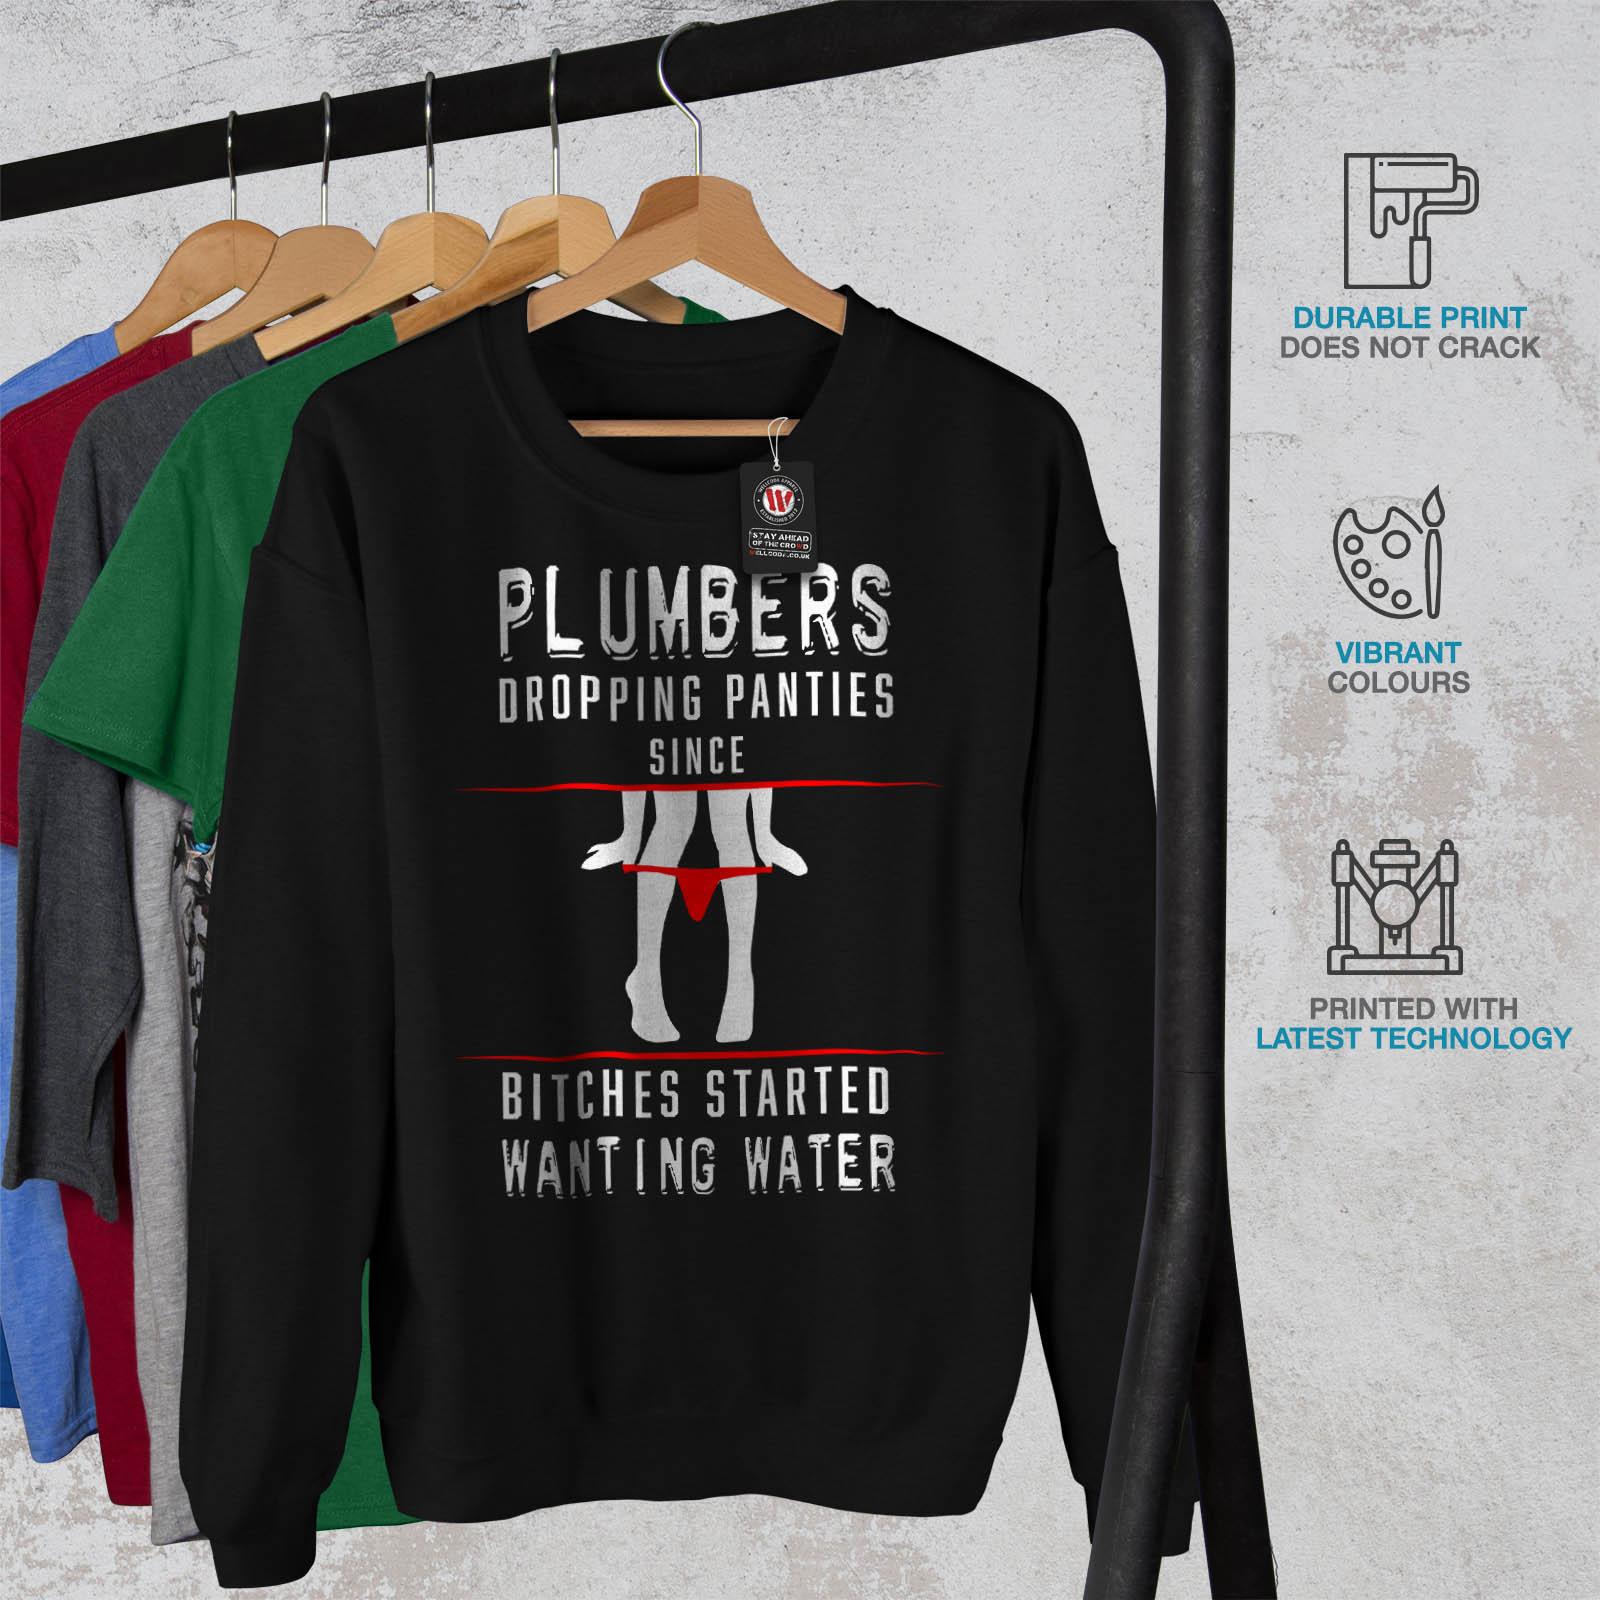 Funy Panties Pullover Black Droping da Casual Plumber uomo Wellcoda Felpa Jumper xXwYSq6x